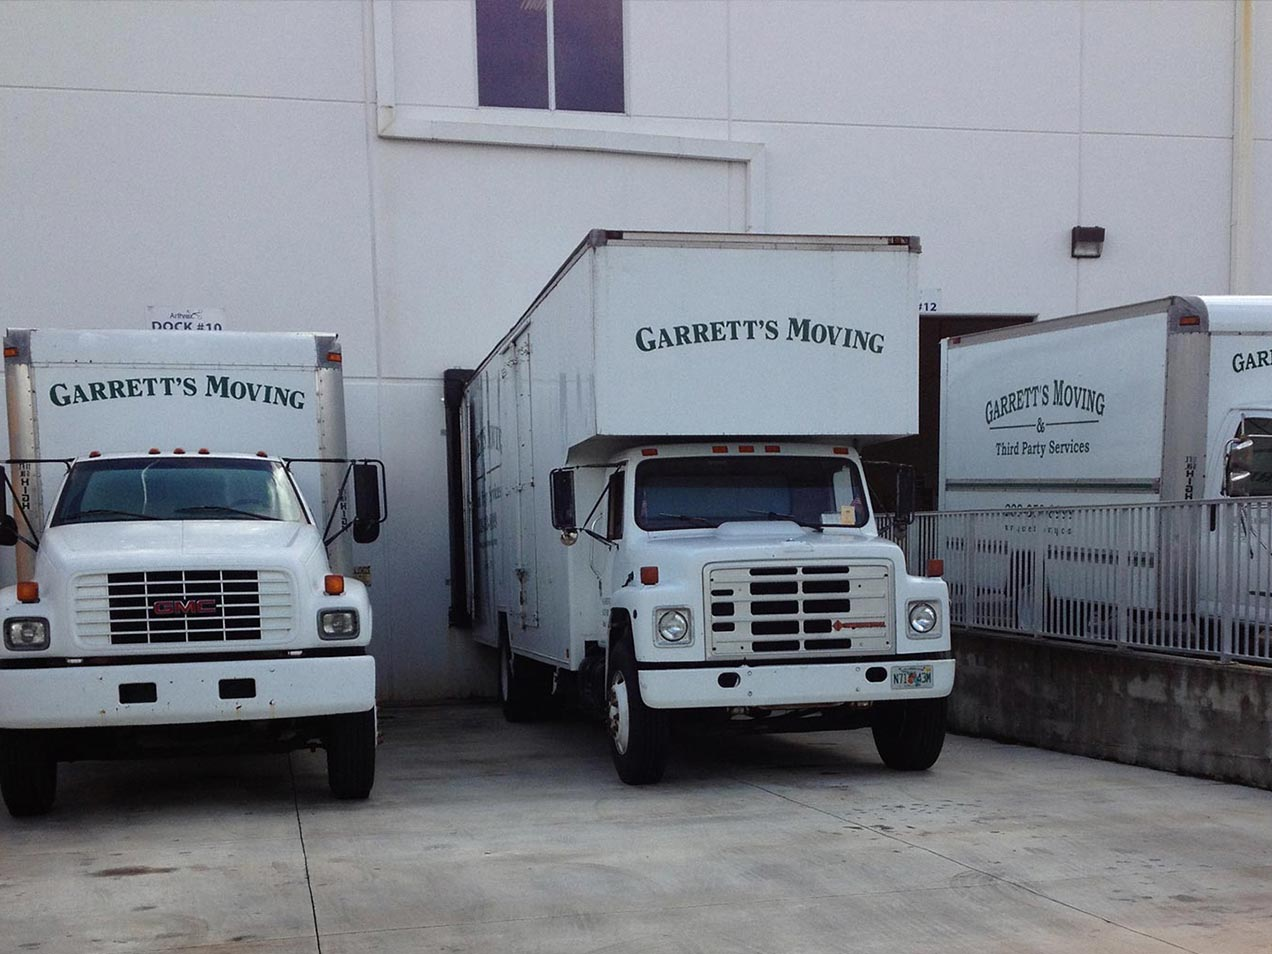 3 Trucks | Garrett's Moving & Third Party Service